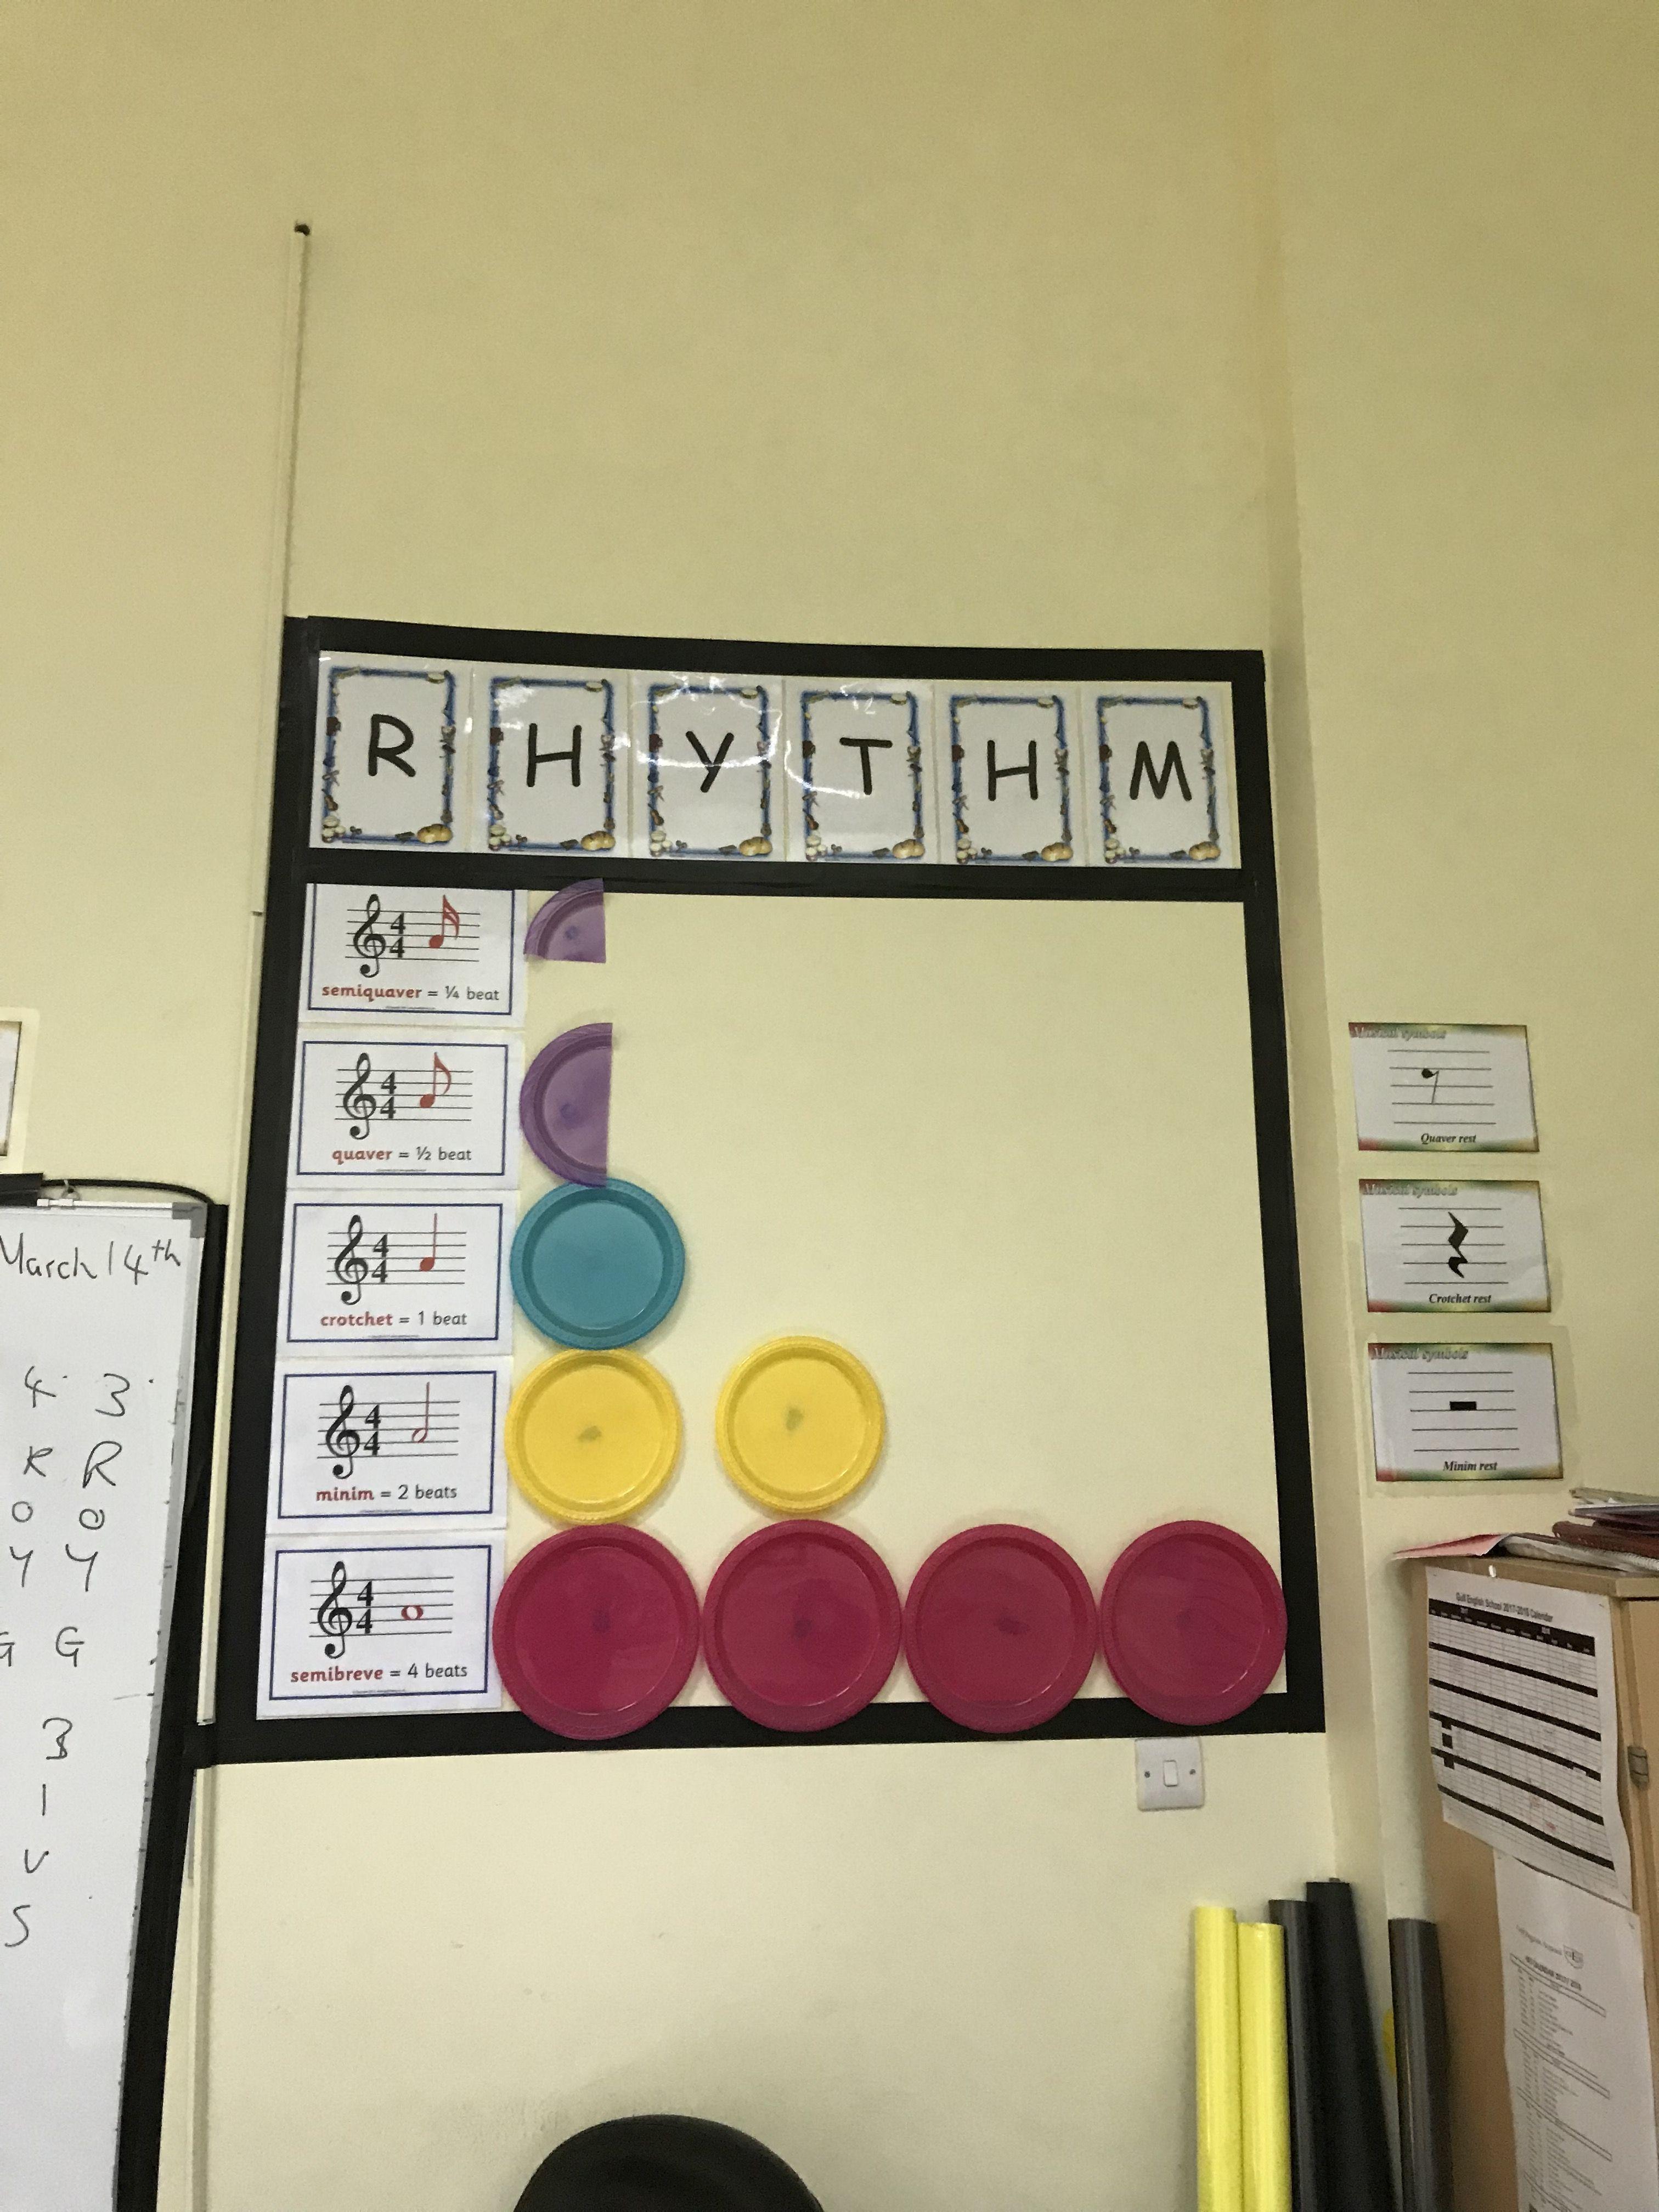 Rhythm Wall Plates Semiquaver Crotchet Minim Semibreve Music Classroom Decor Wall